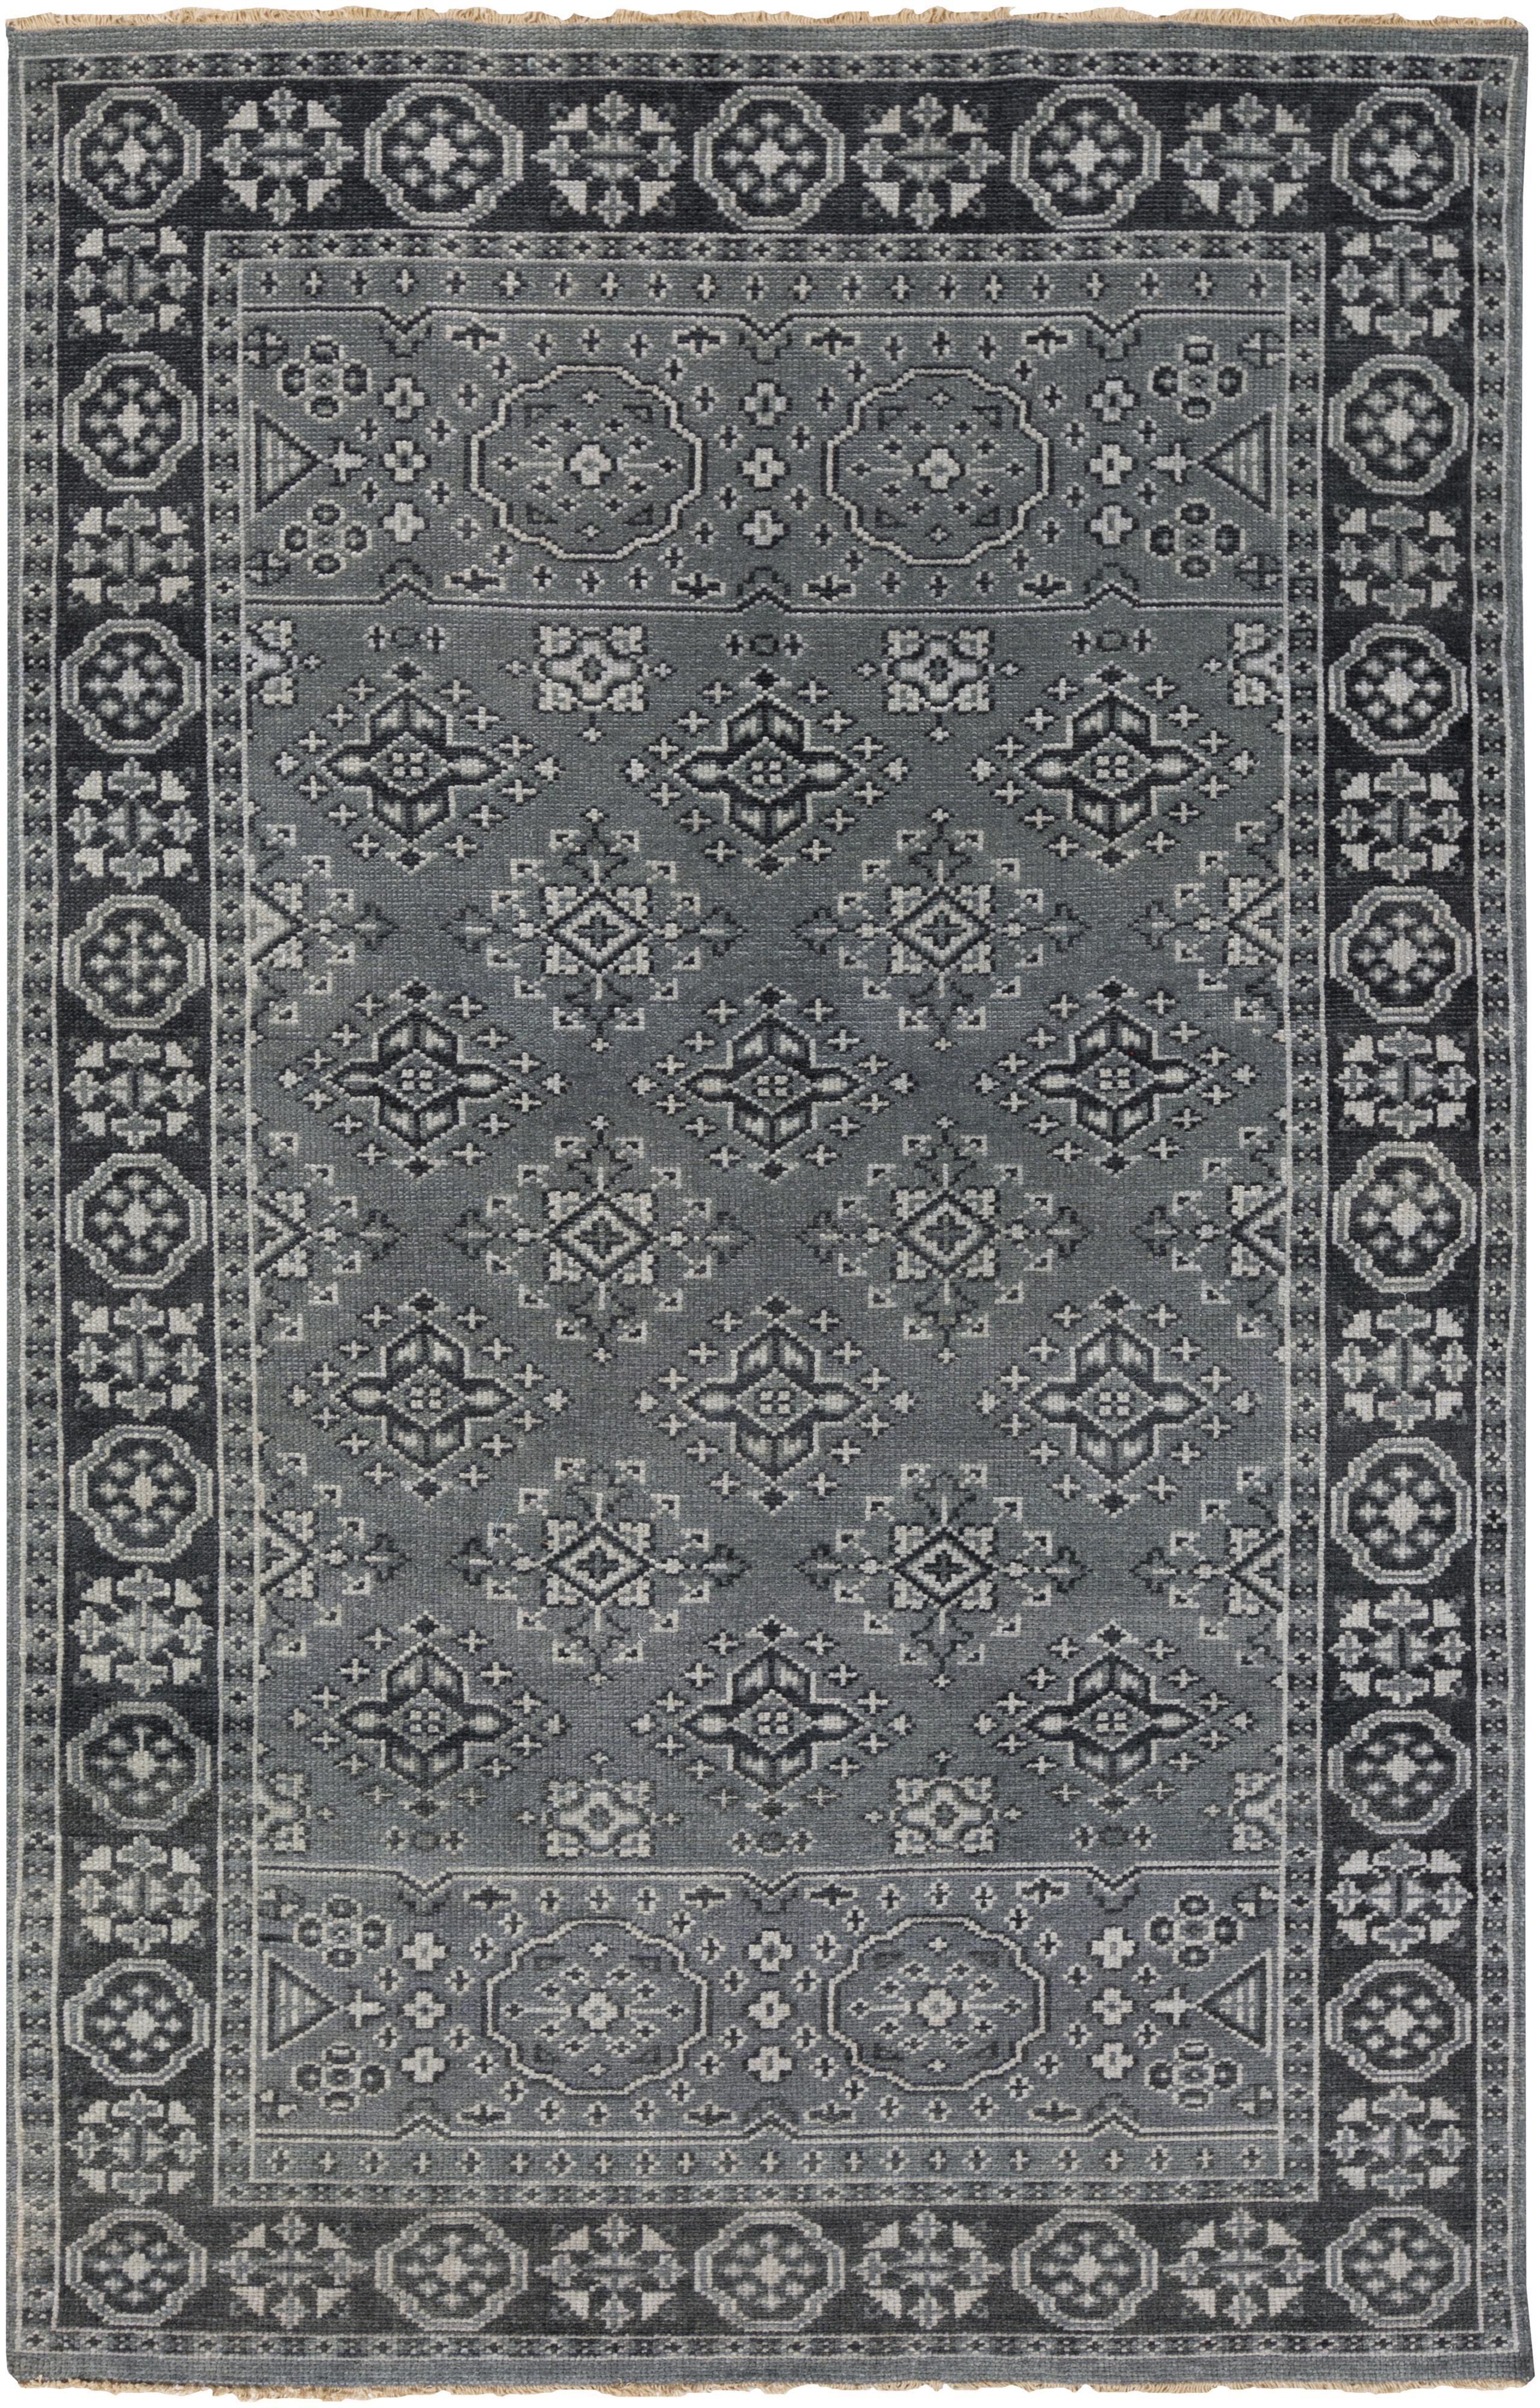 Cappadocia 8' x 11' by 9596 at Becker Furniture